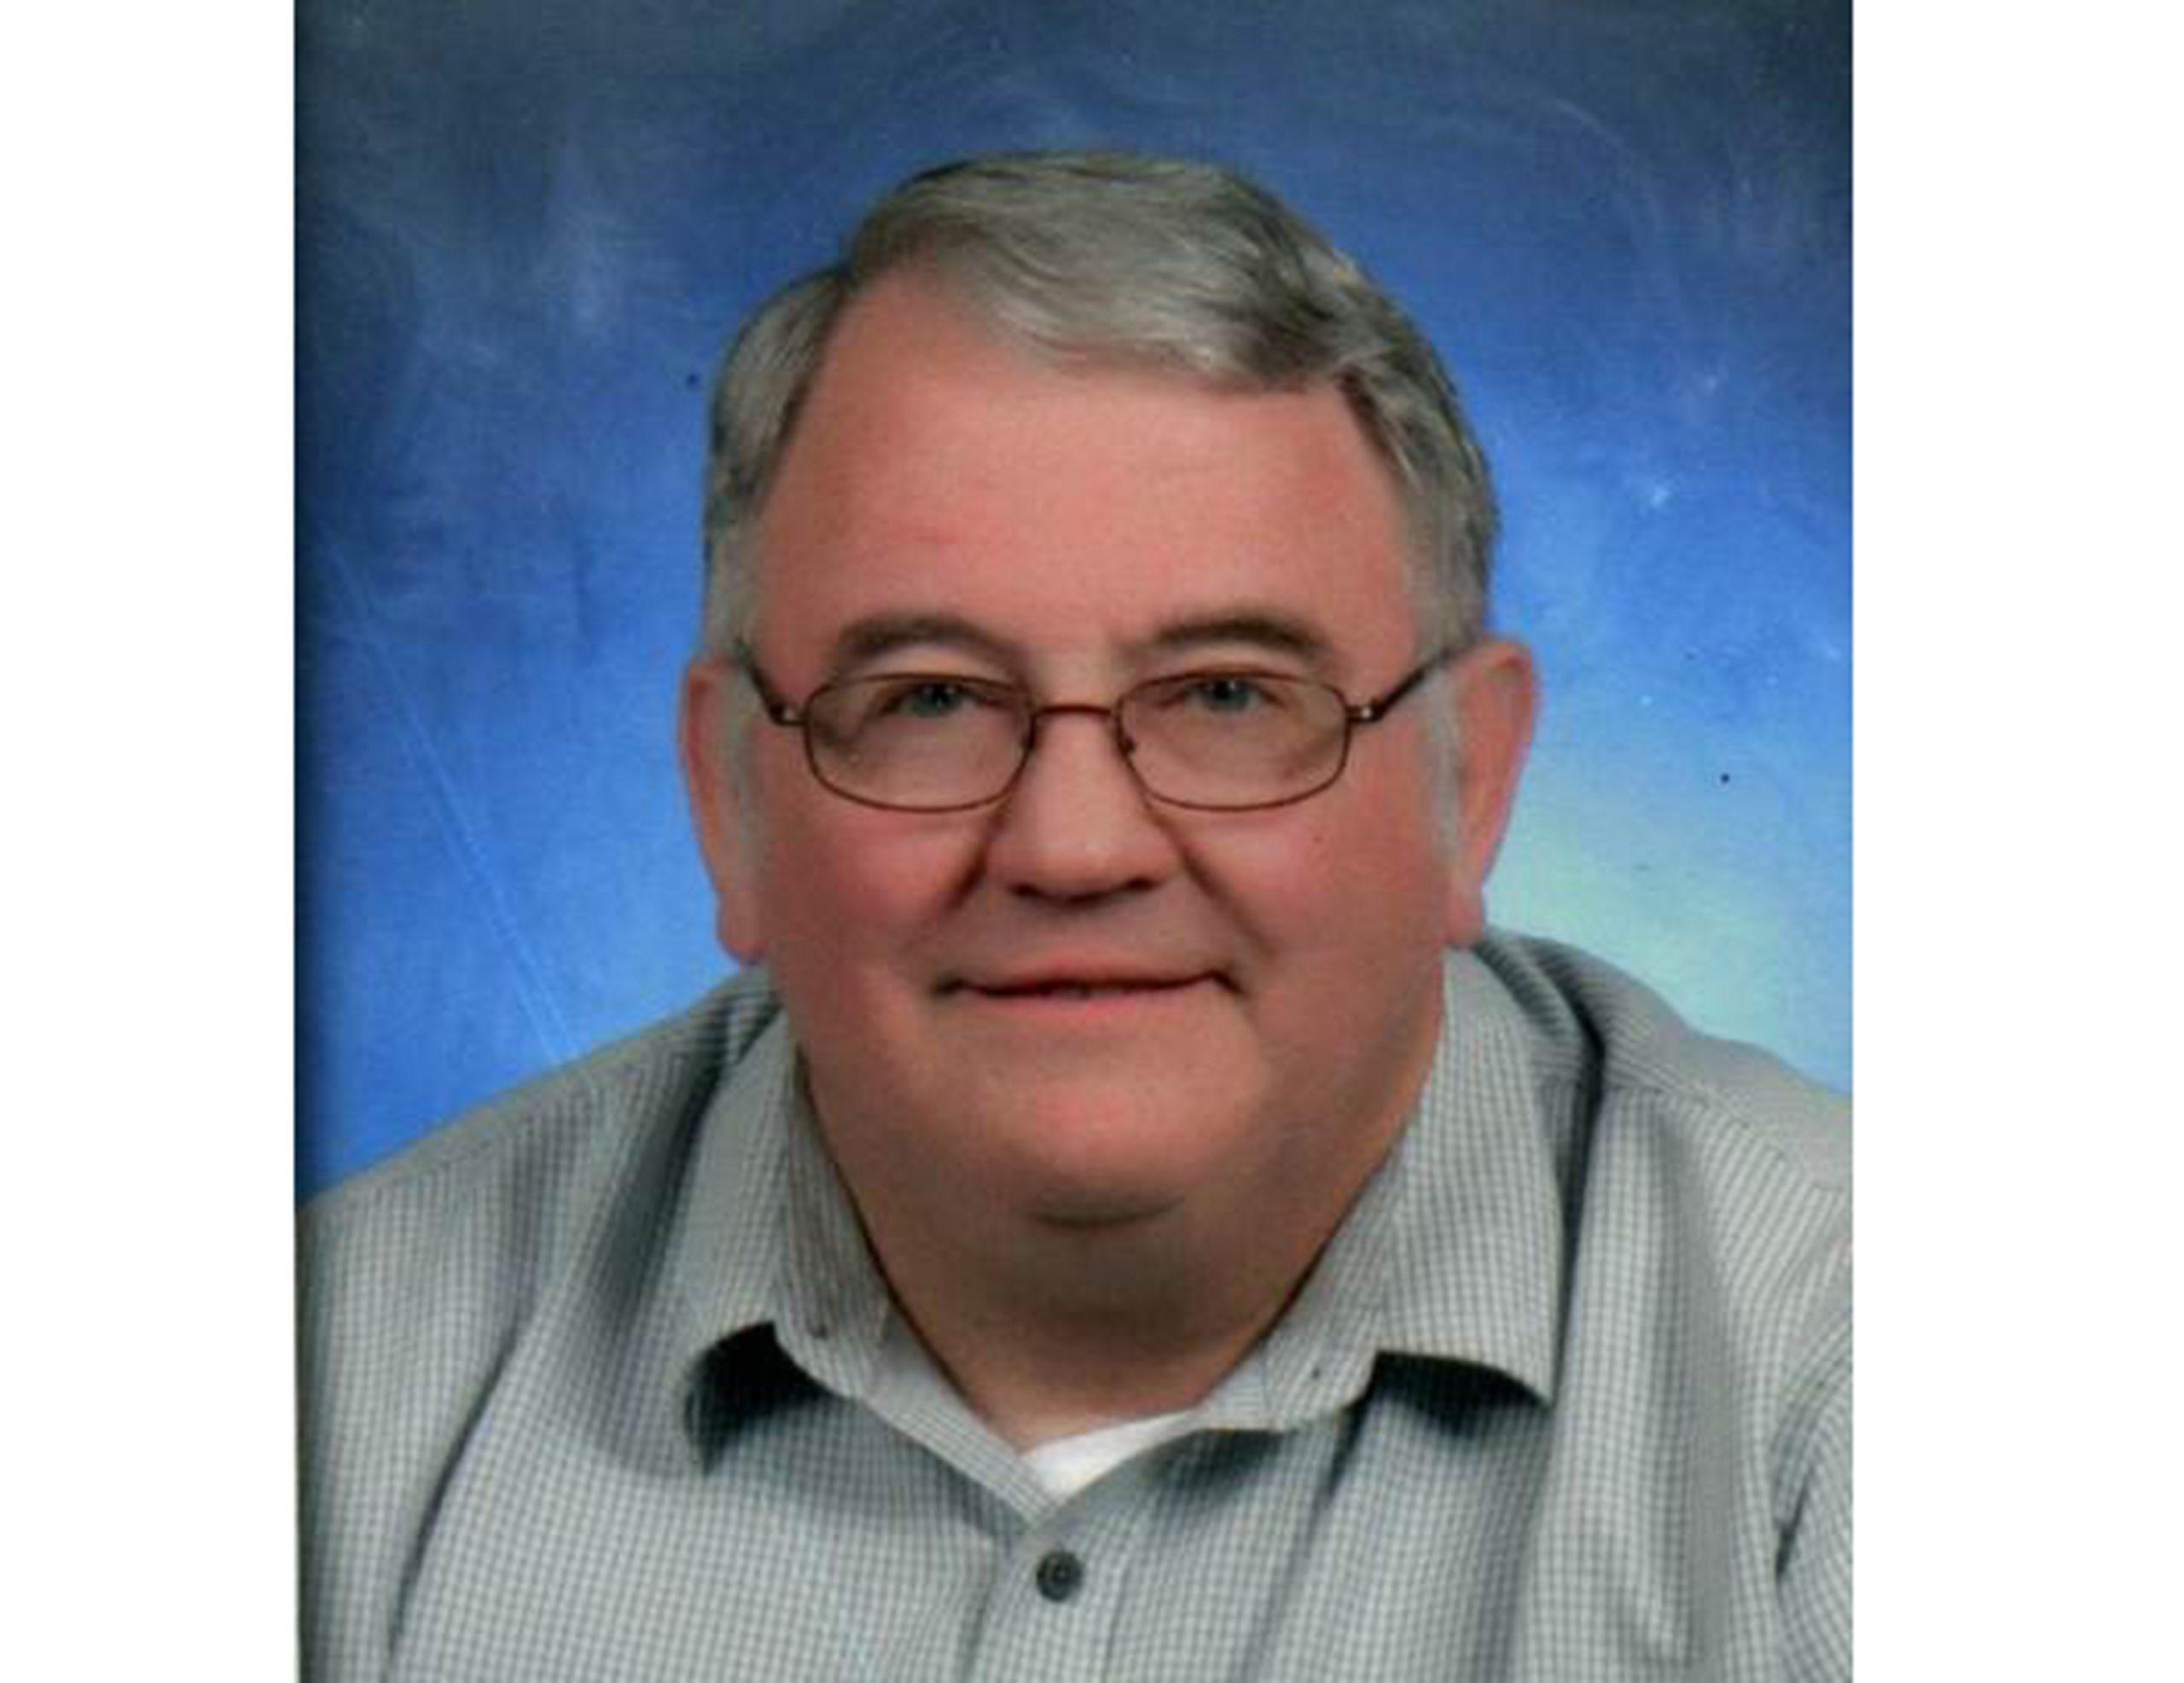 Obituary: Mike Quarles